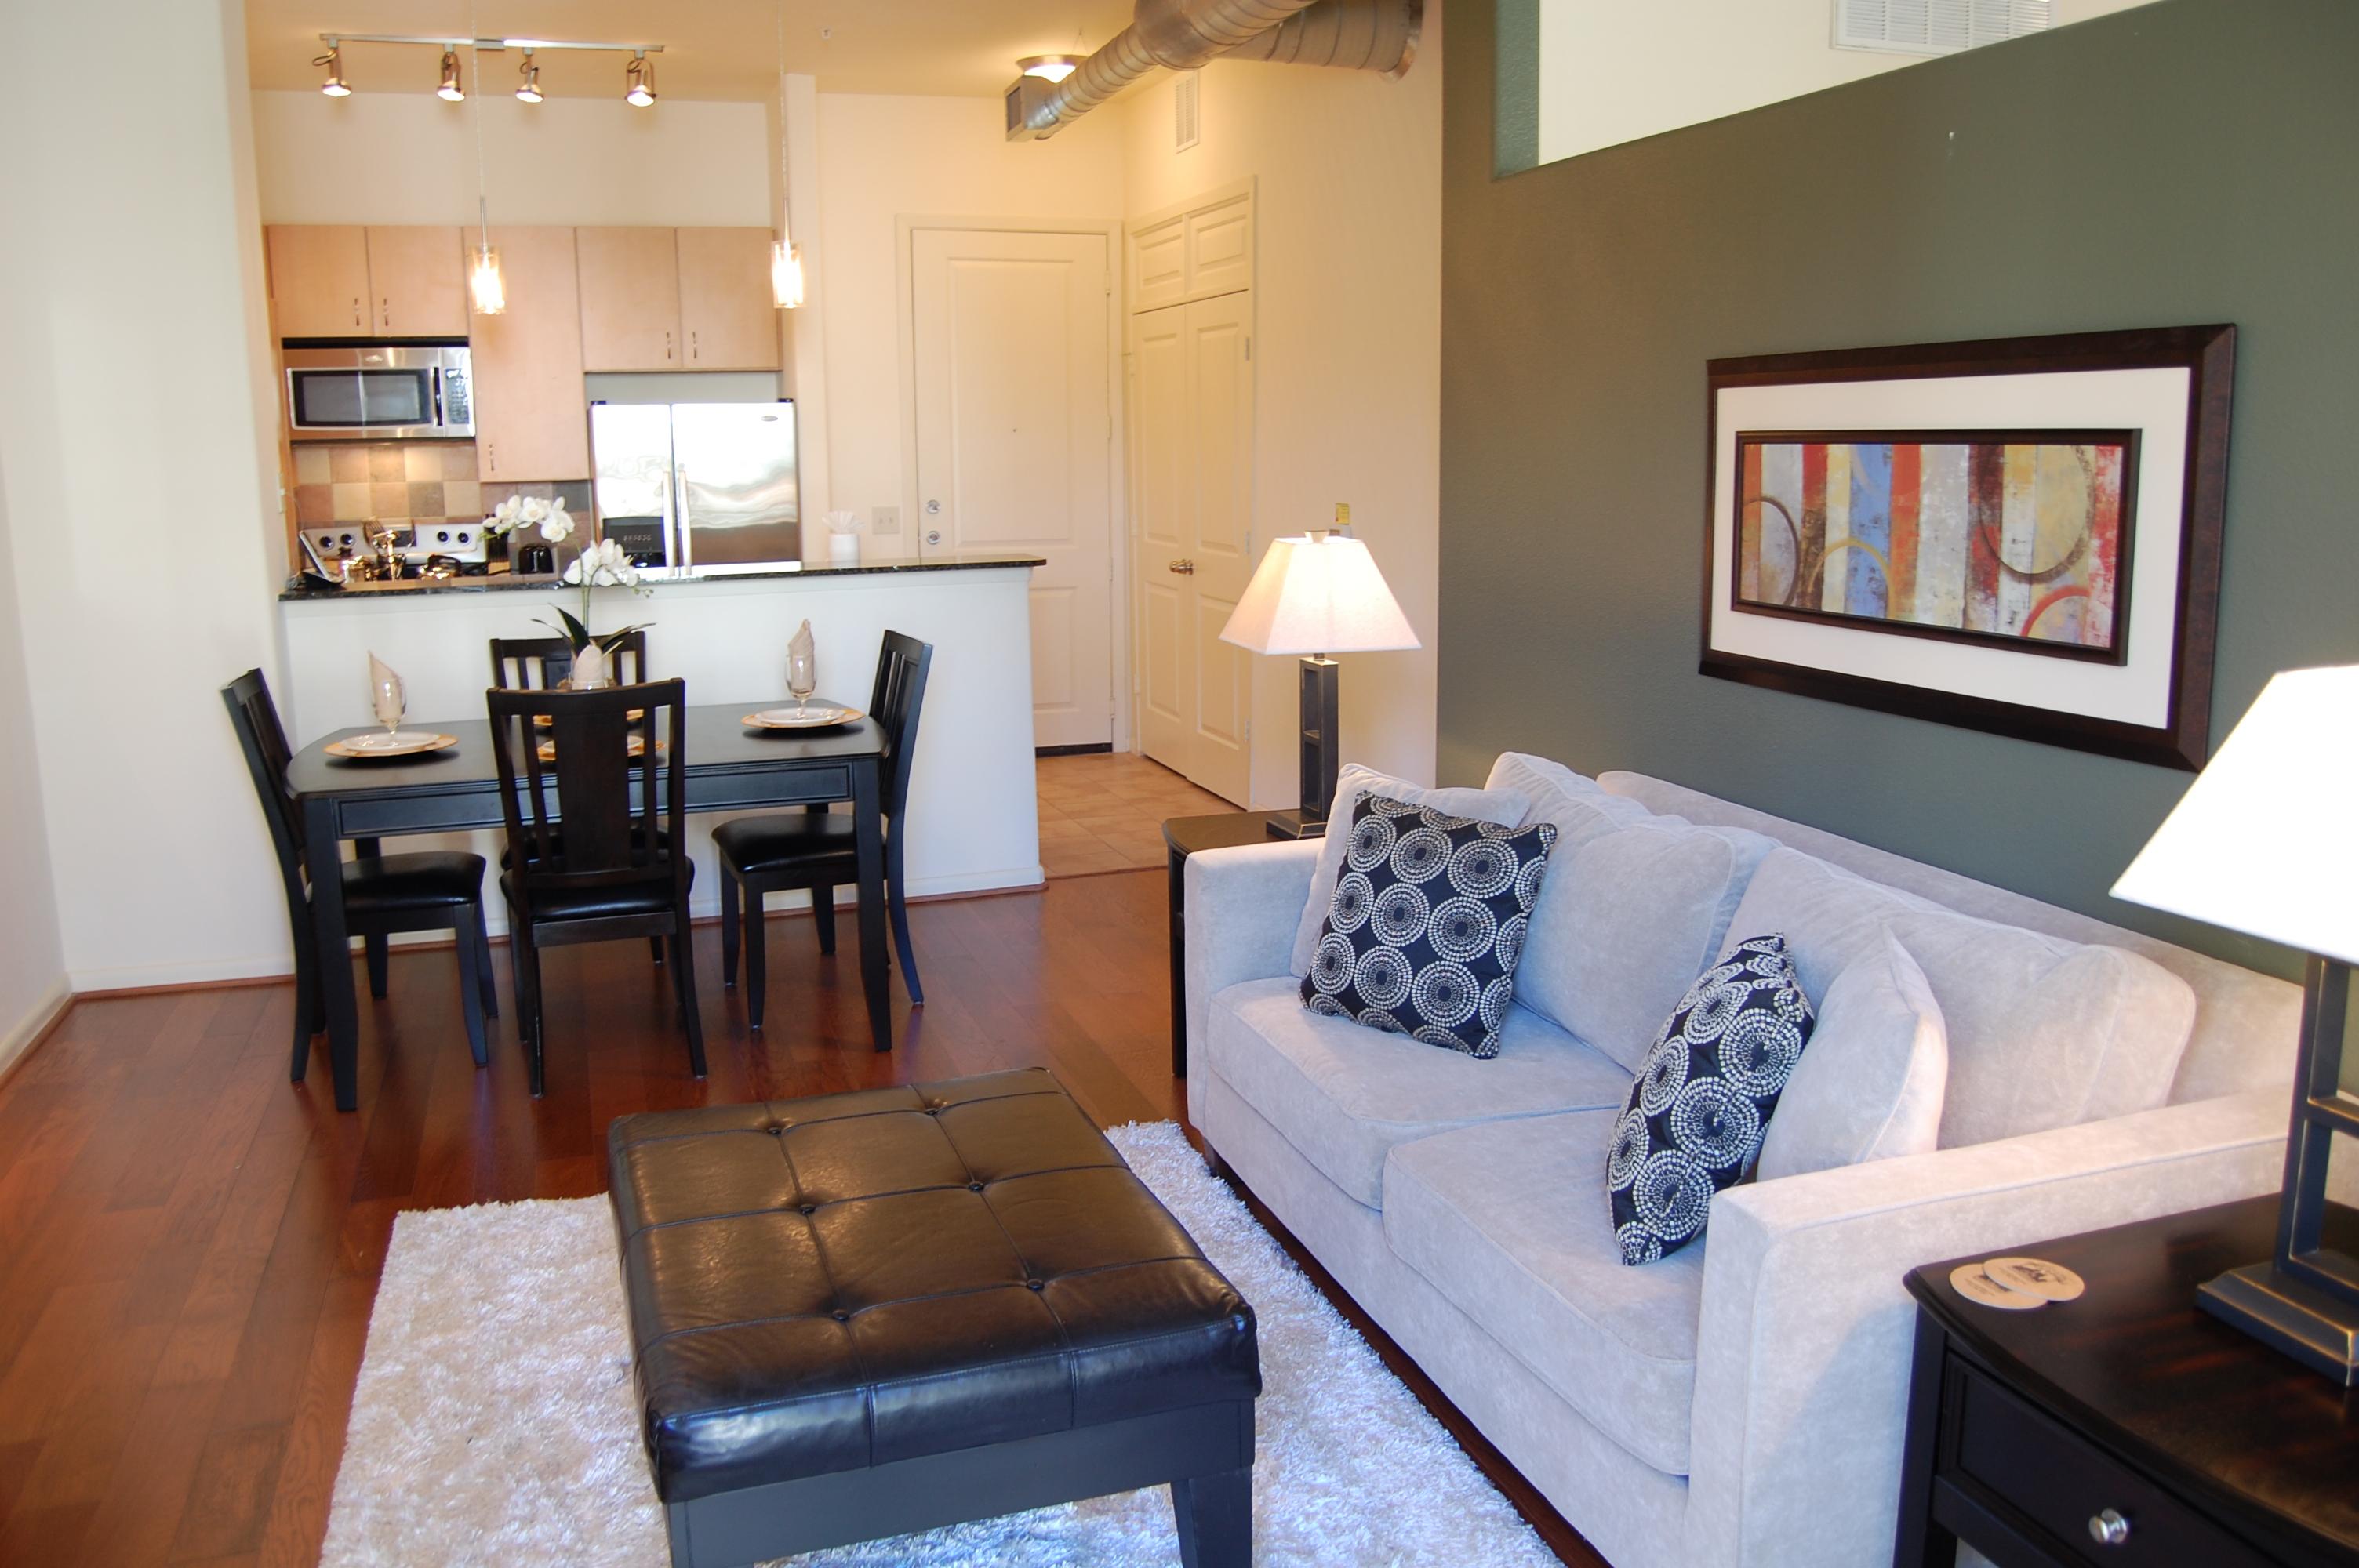 Briar-Forest-Lofts-Living-Room